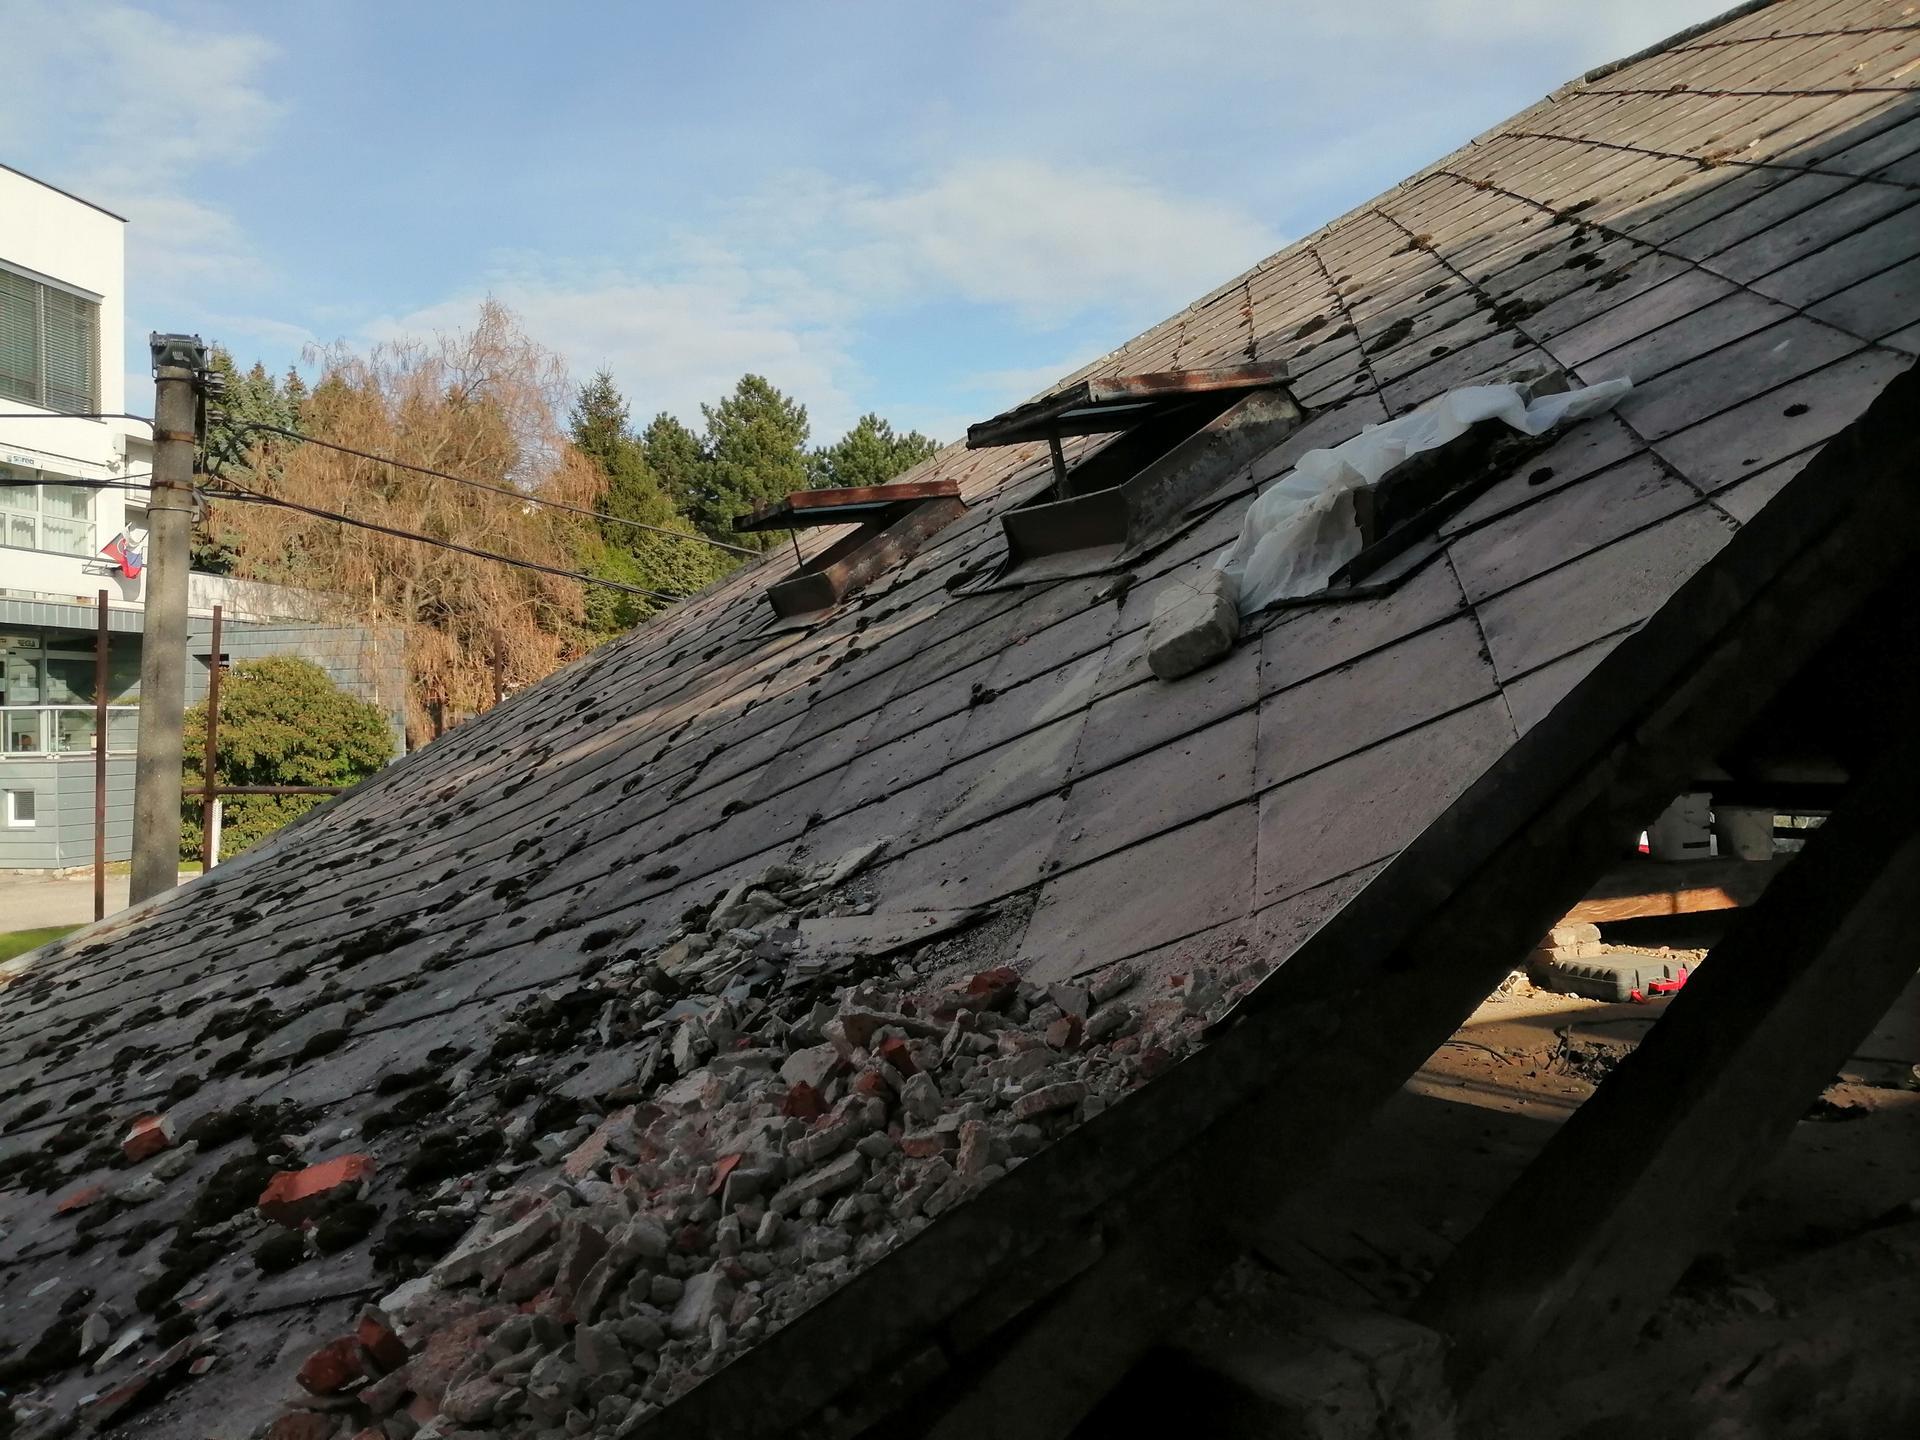 Prestavba podkrovia zo sedlovo valbovej na sedlovú strechu. - Obrázok č. 45